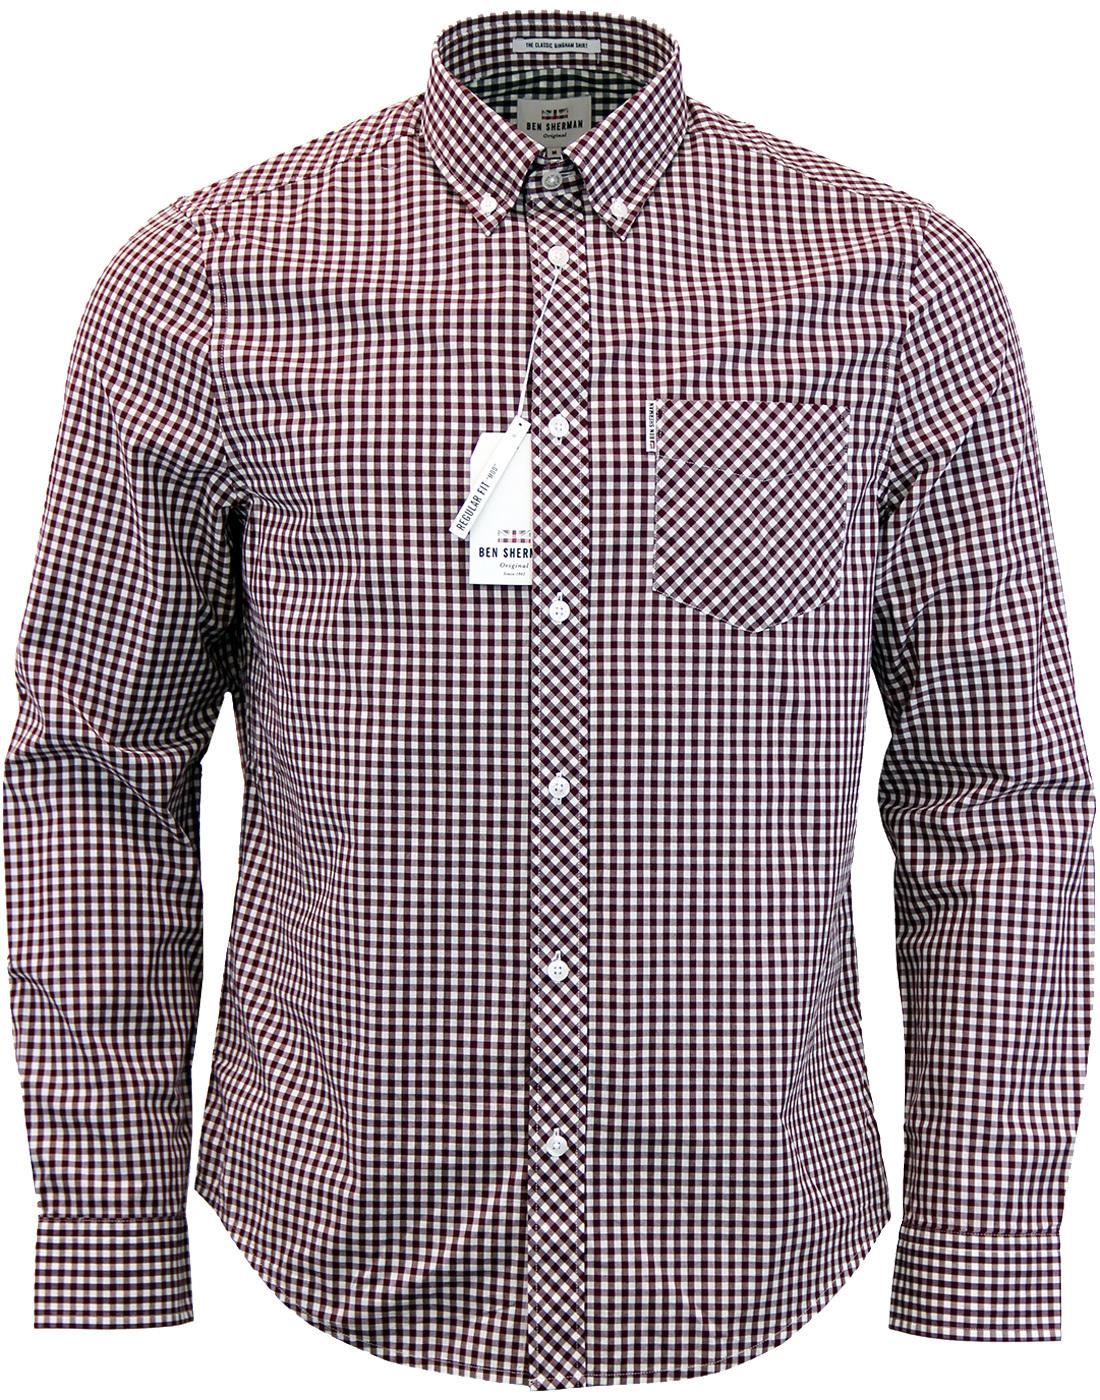 2fa90dda22 BEN SHERMAN Mens Retro Mod 60s Gingham Shirt in Oxblood